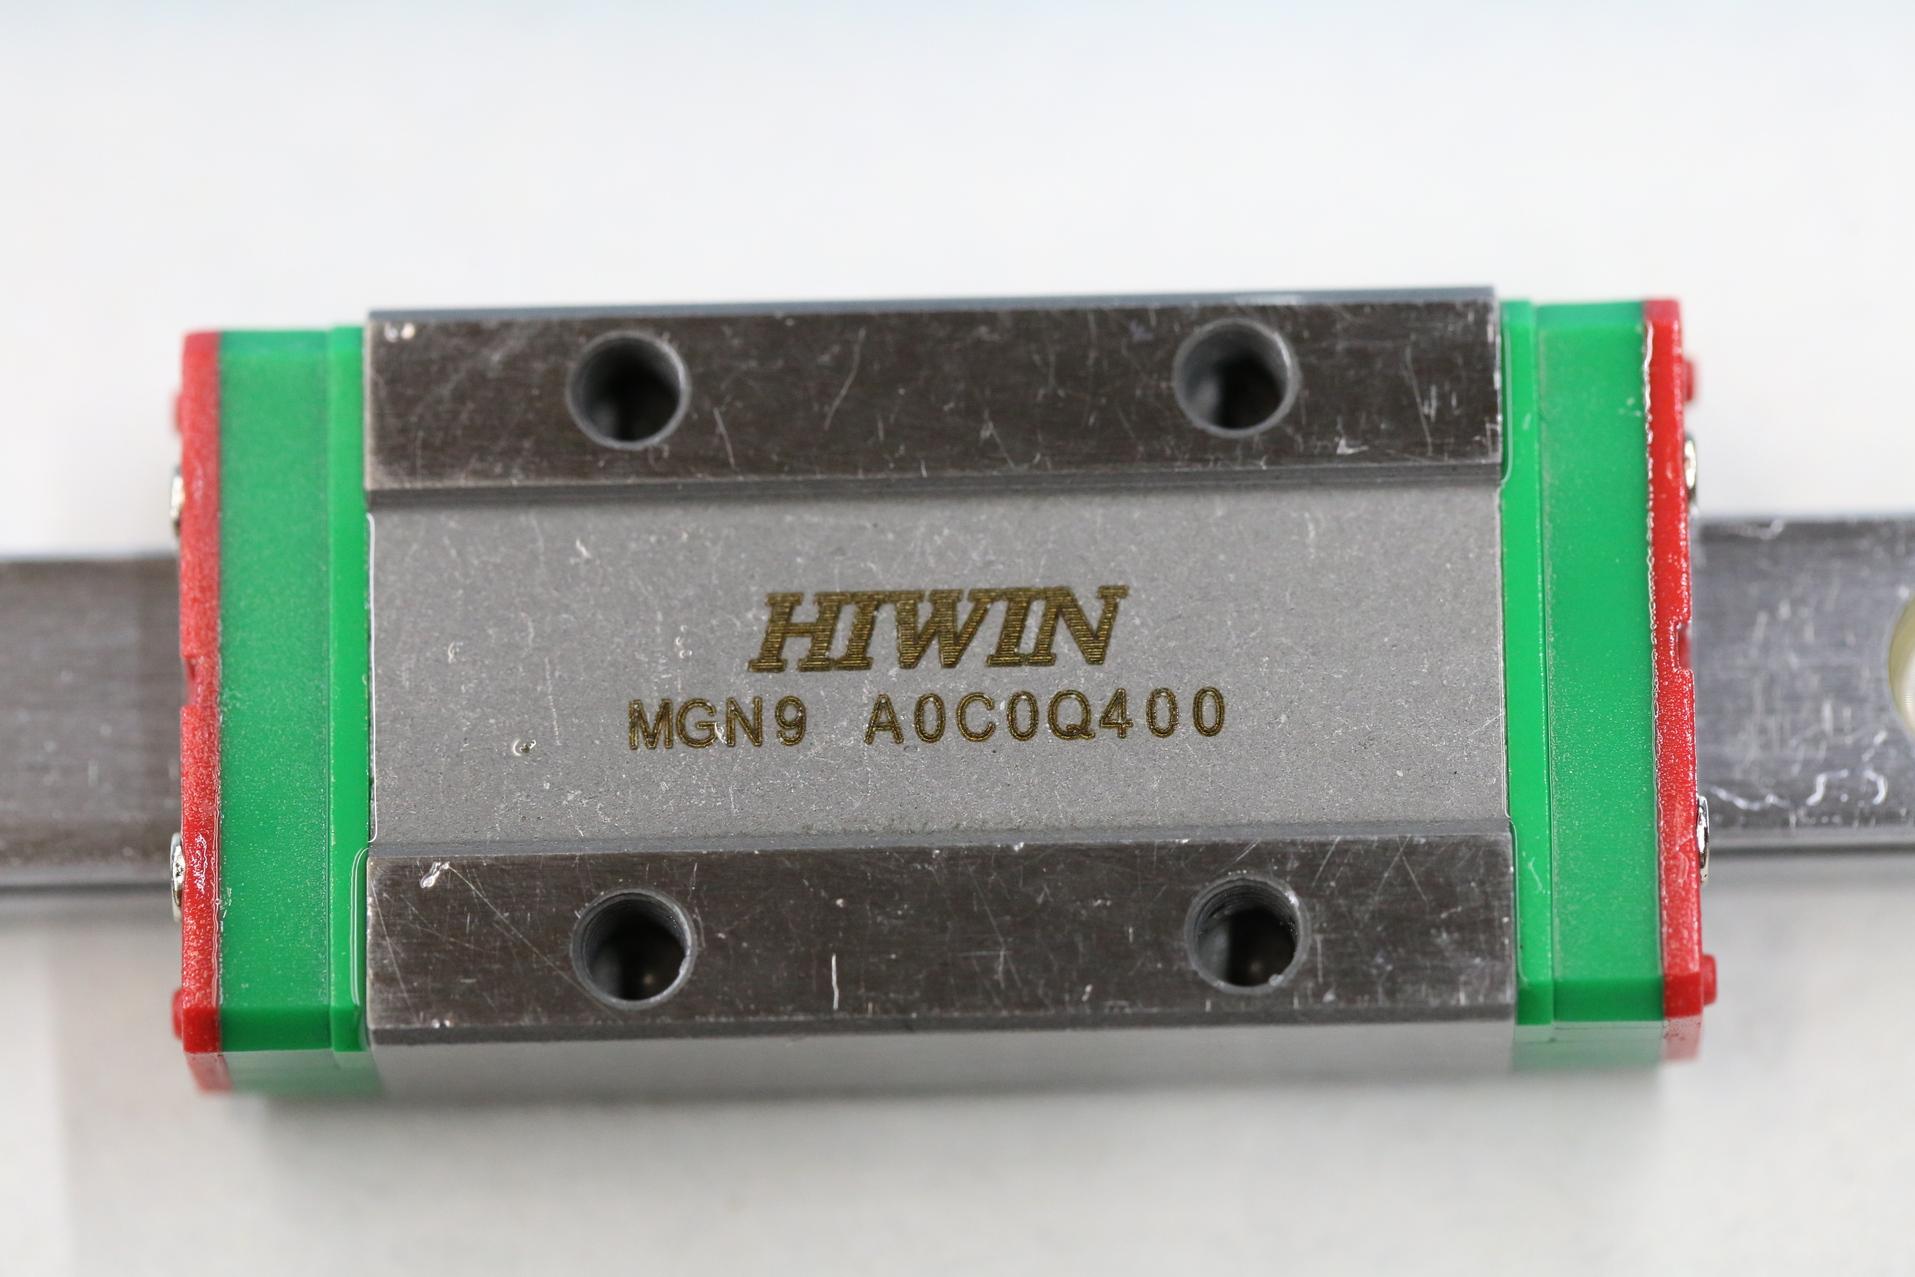 HIWIN-Linear-Rails-in-Funssor-Voron-Kit-1